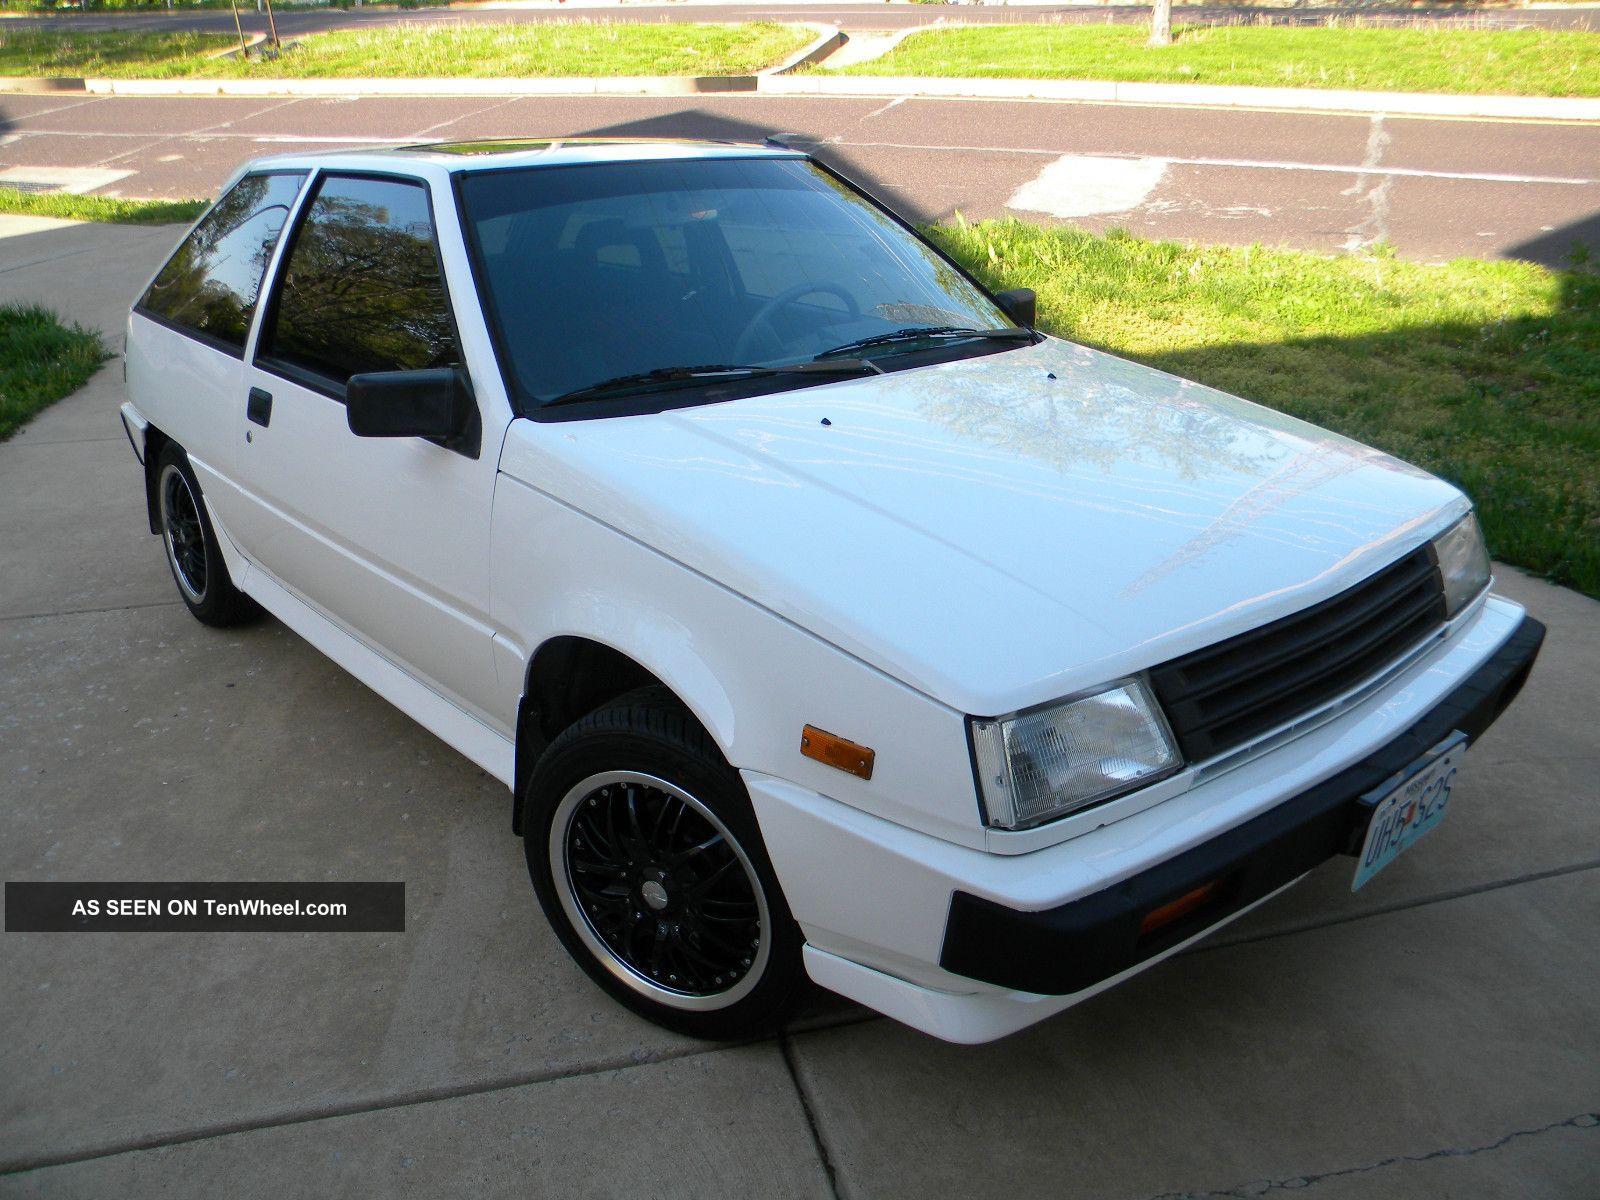 1988 Mitsubishi Mirage Turbo Colt Turbo